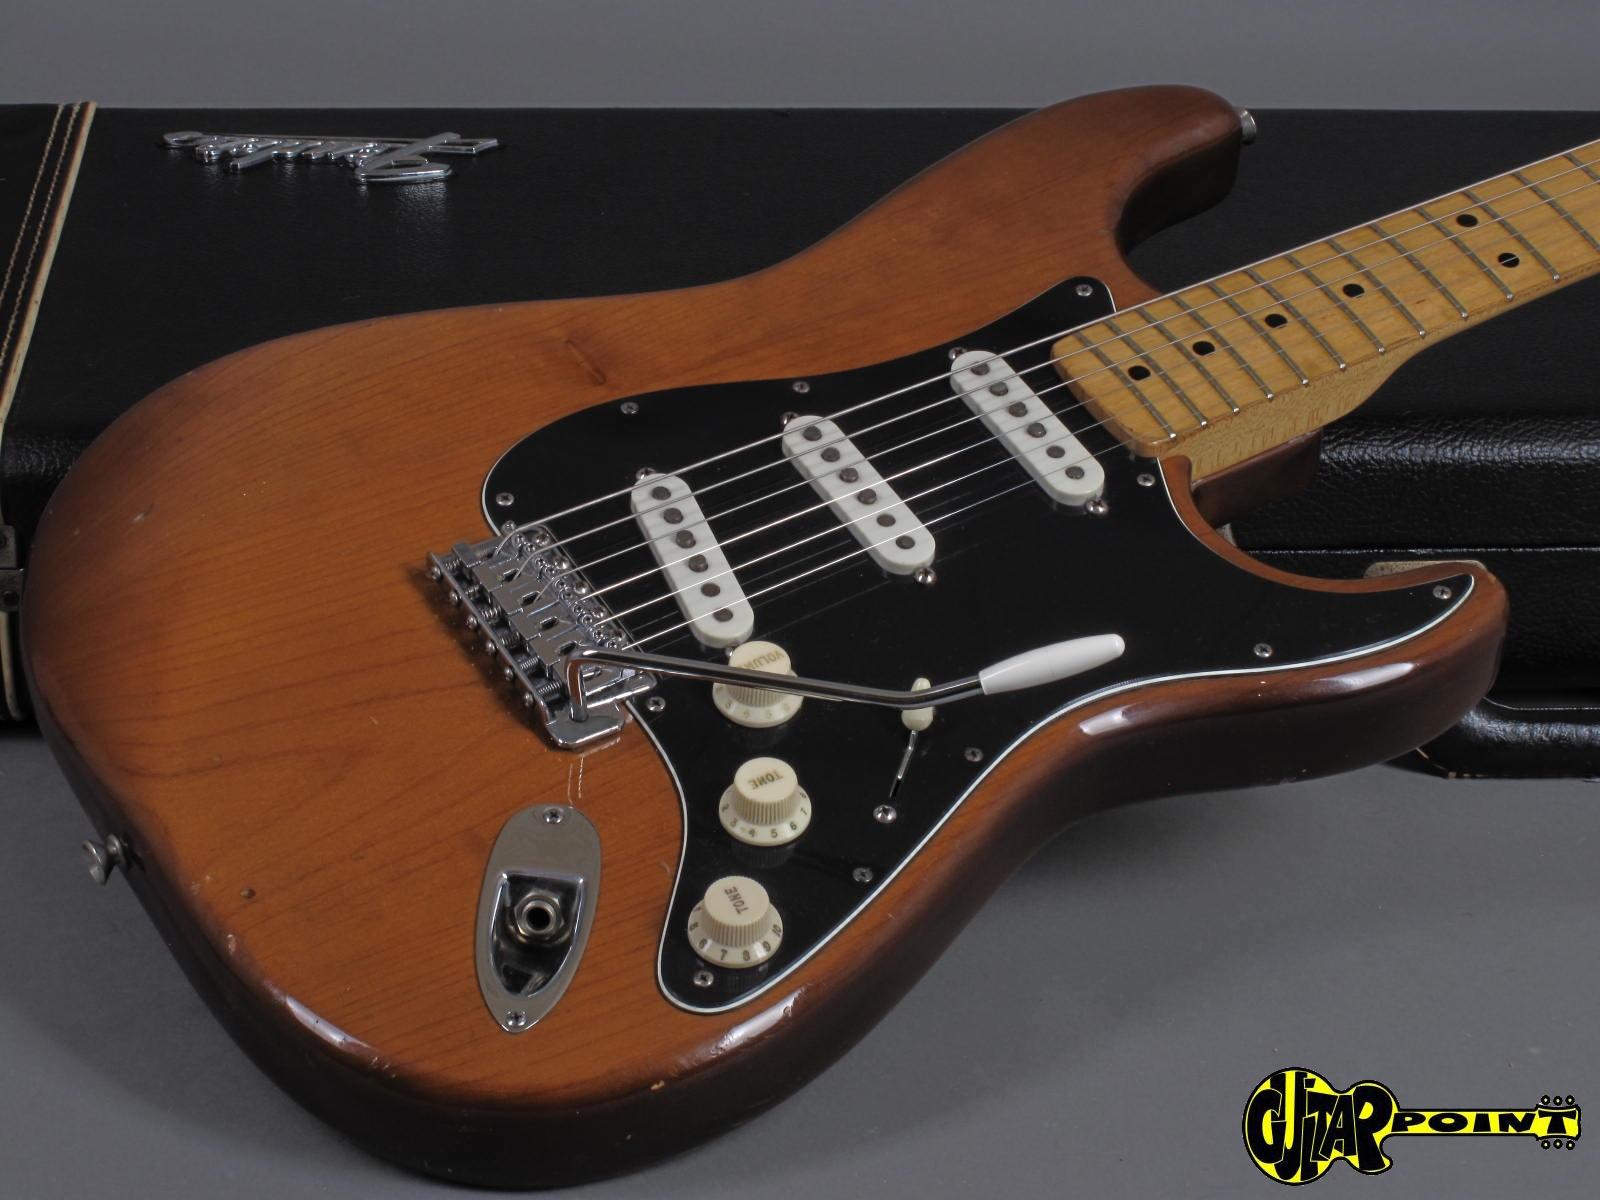 https://guitarpoint.de/app/uploads/products/1974-fender-stratocaster-mocha-2/Fender74StrMocha532533_17.jpg